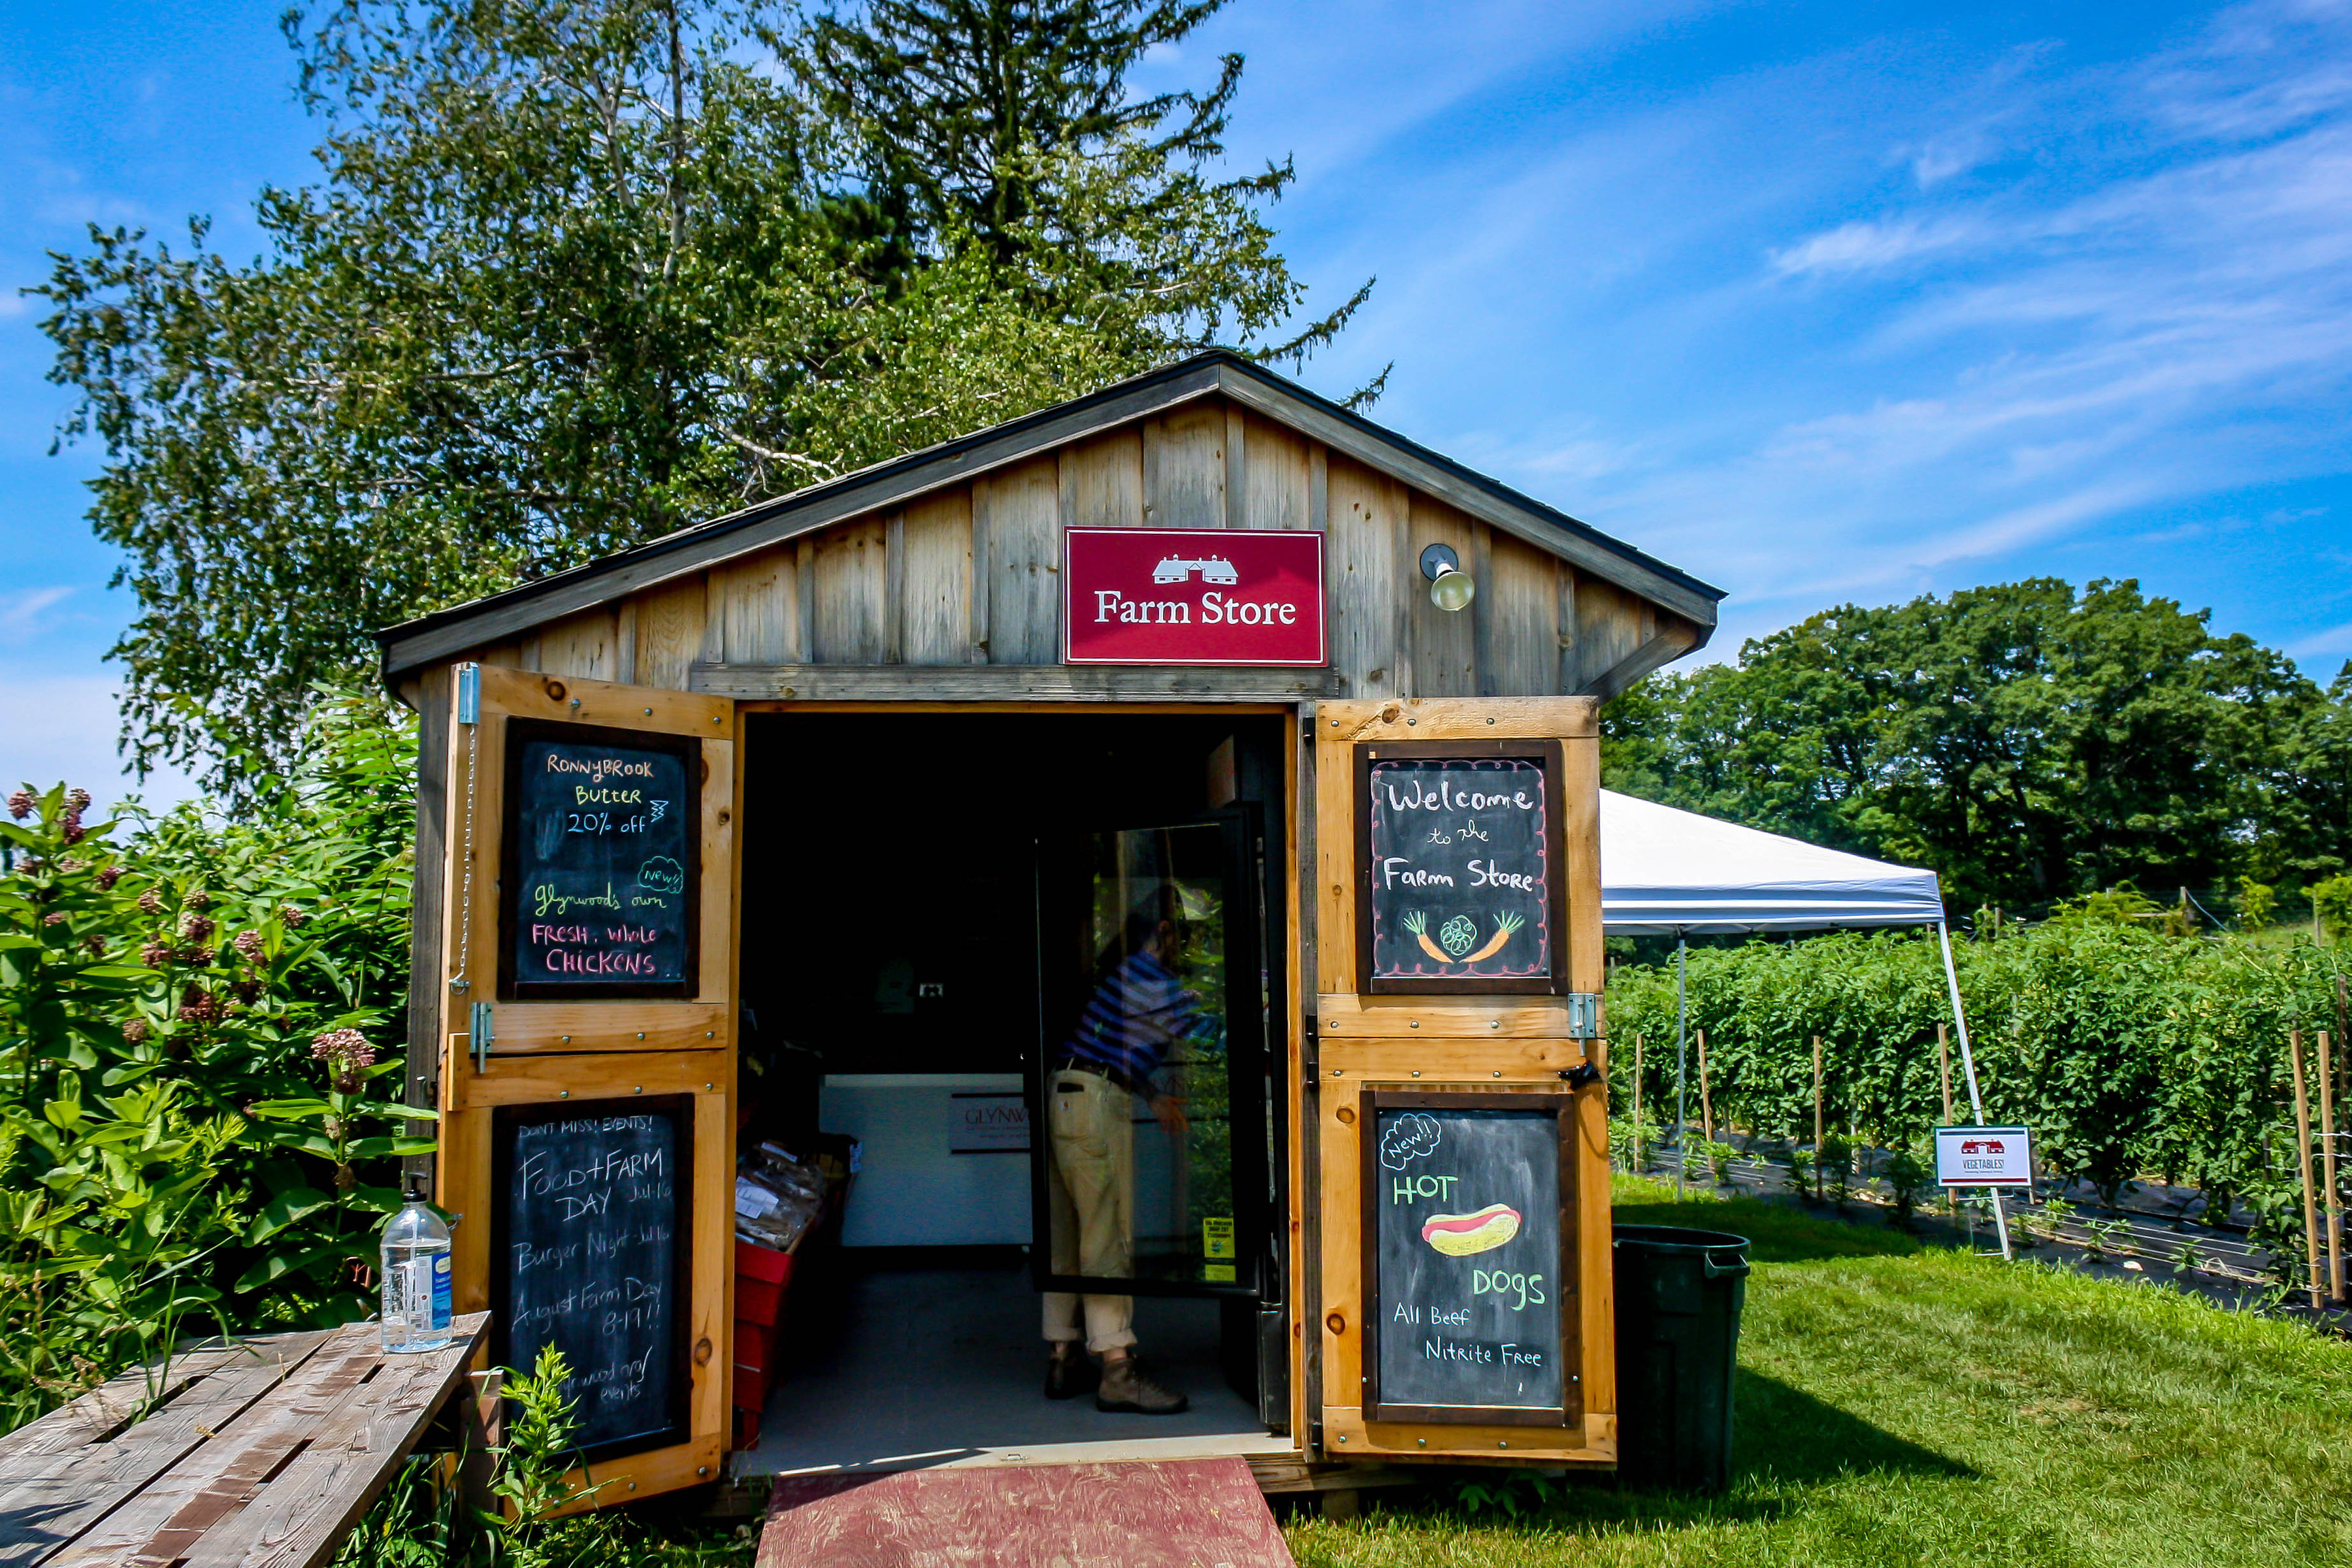 Exploring Farm Marketing